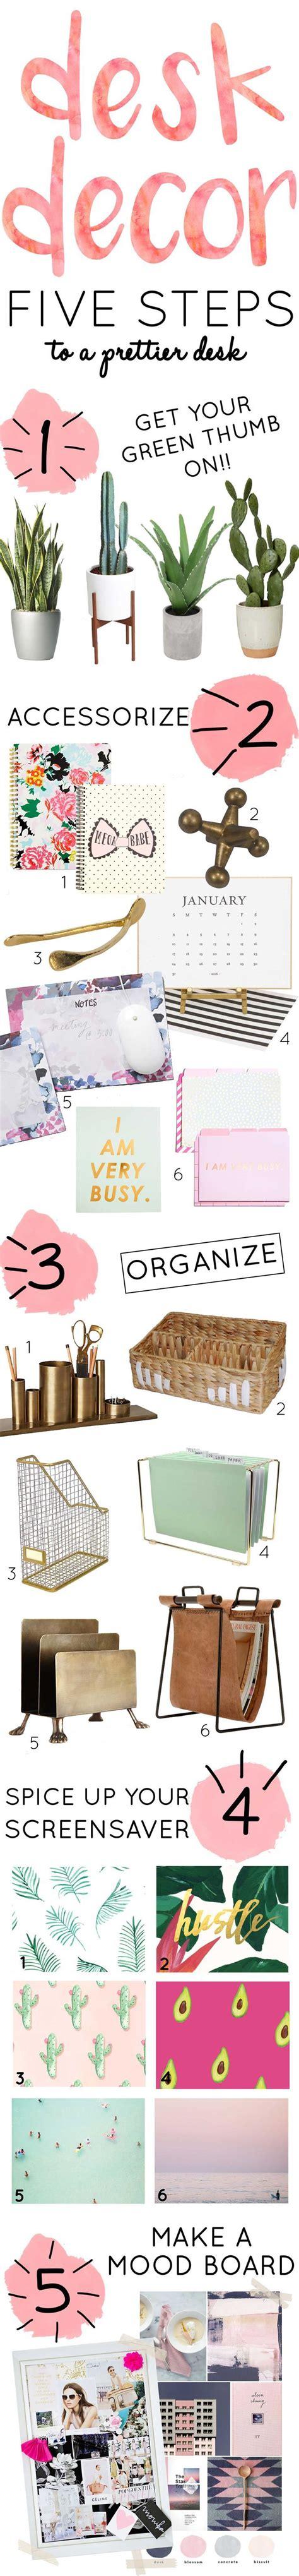 faux designs desk calendar best 25 work desk ideas on pinterest office ideas for